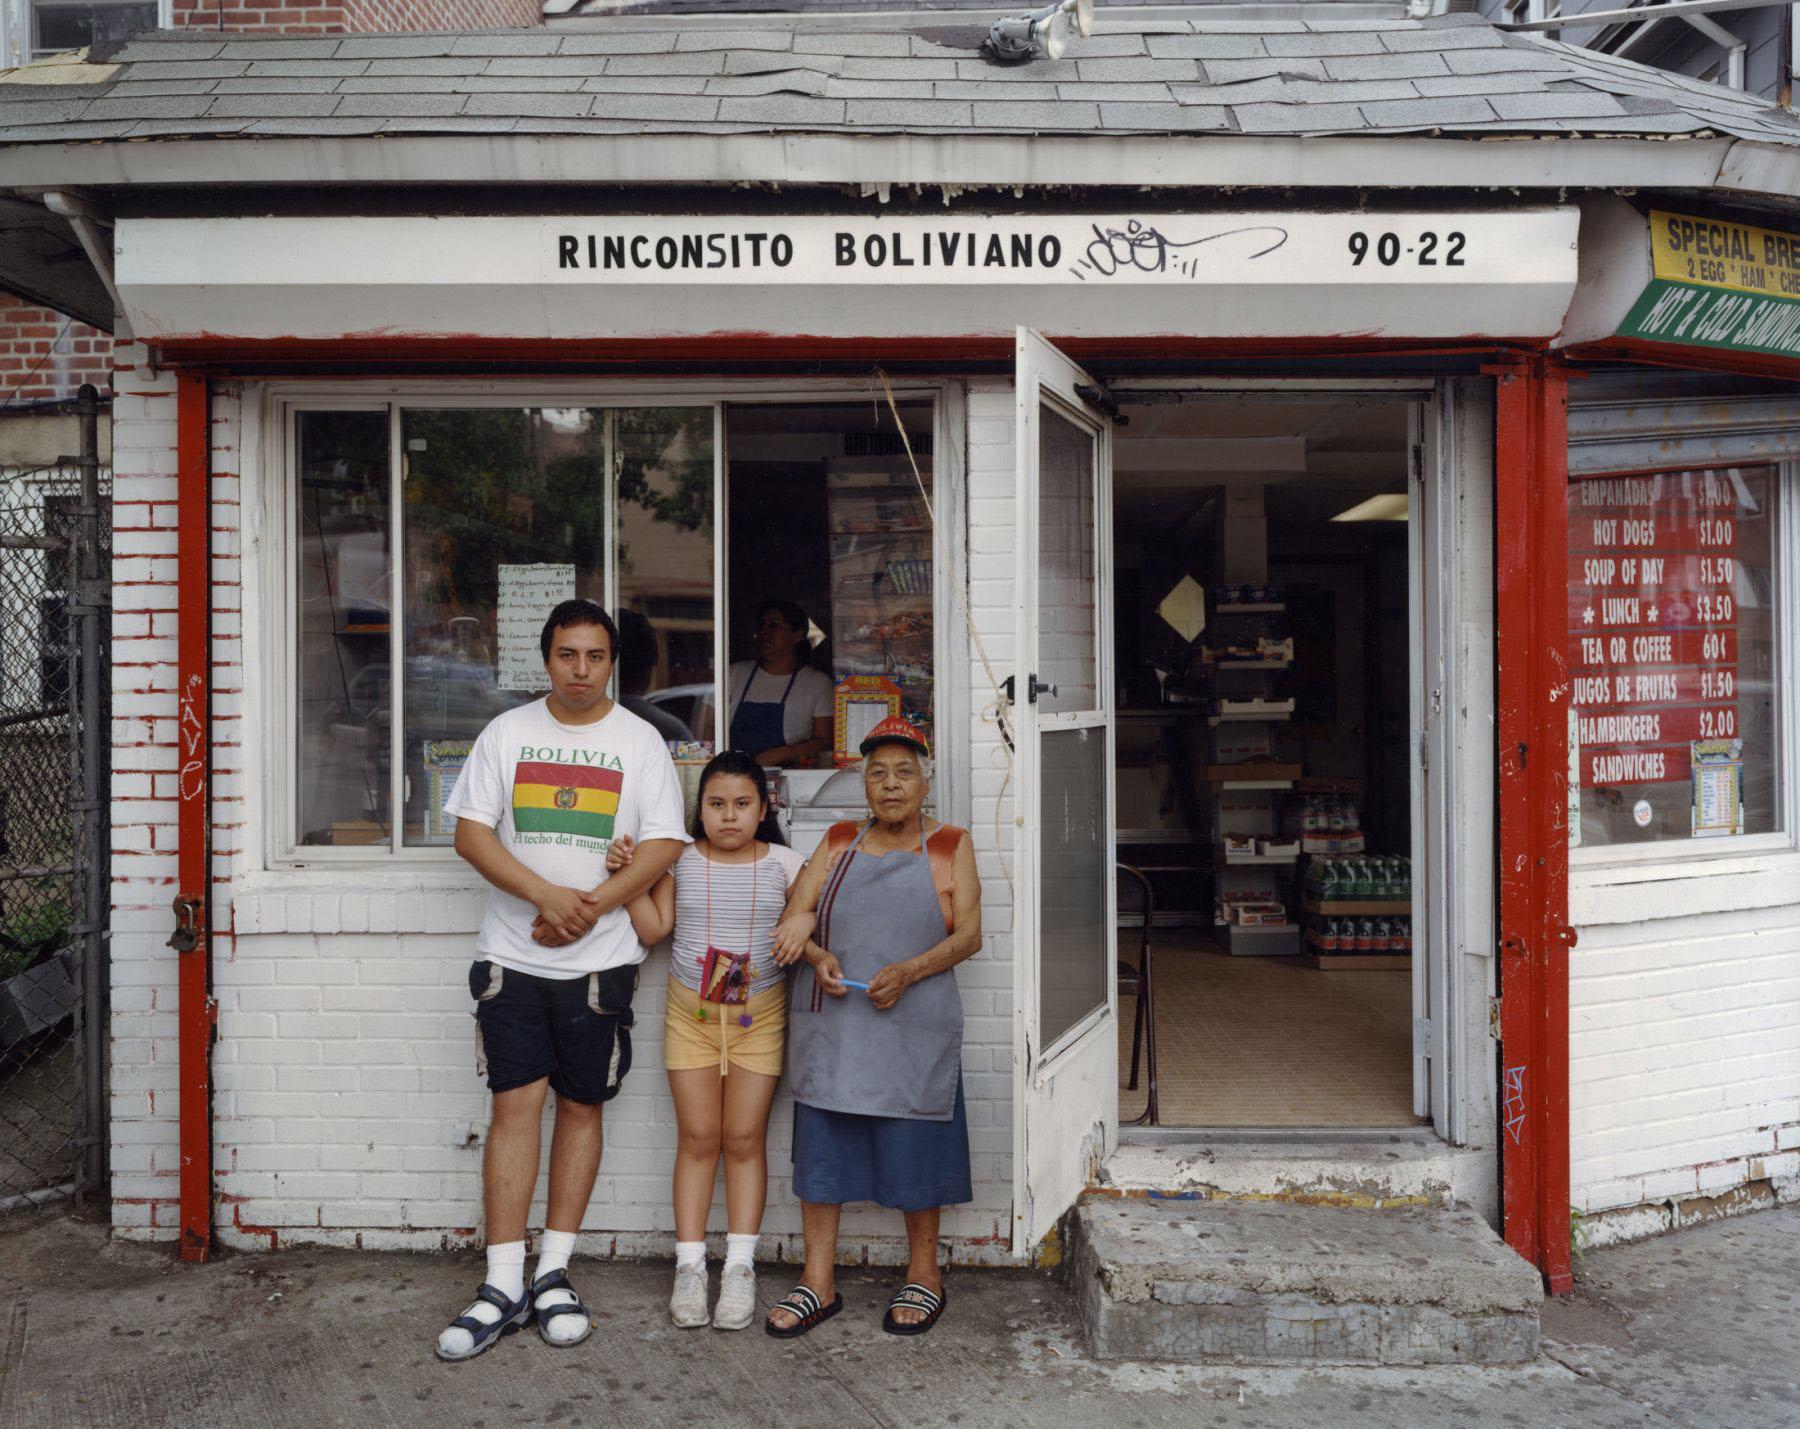 Rinconsito Boliviano, 90-22 Corona Avenue, Corona, Queens , September 2003